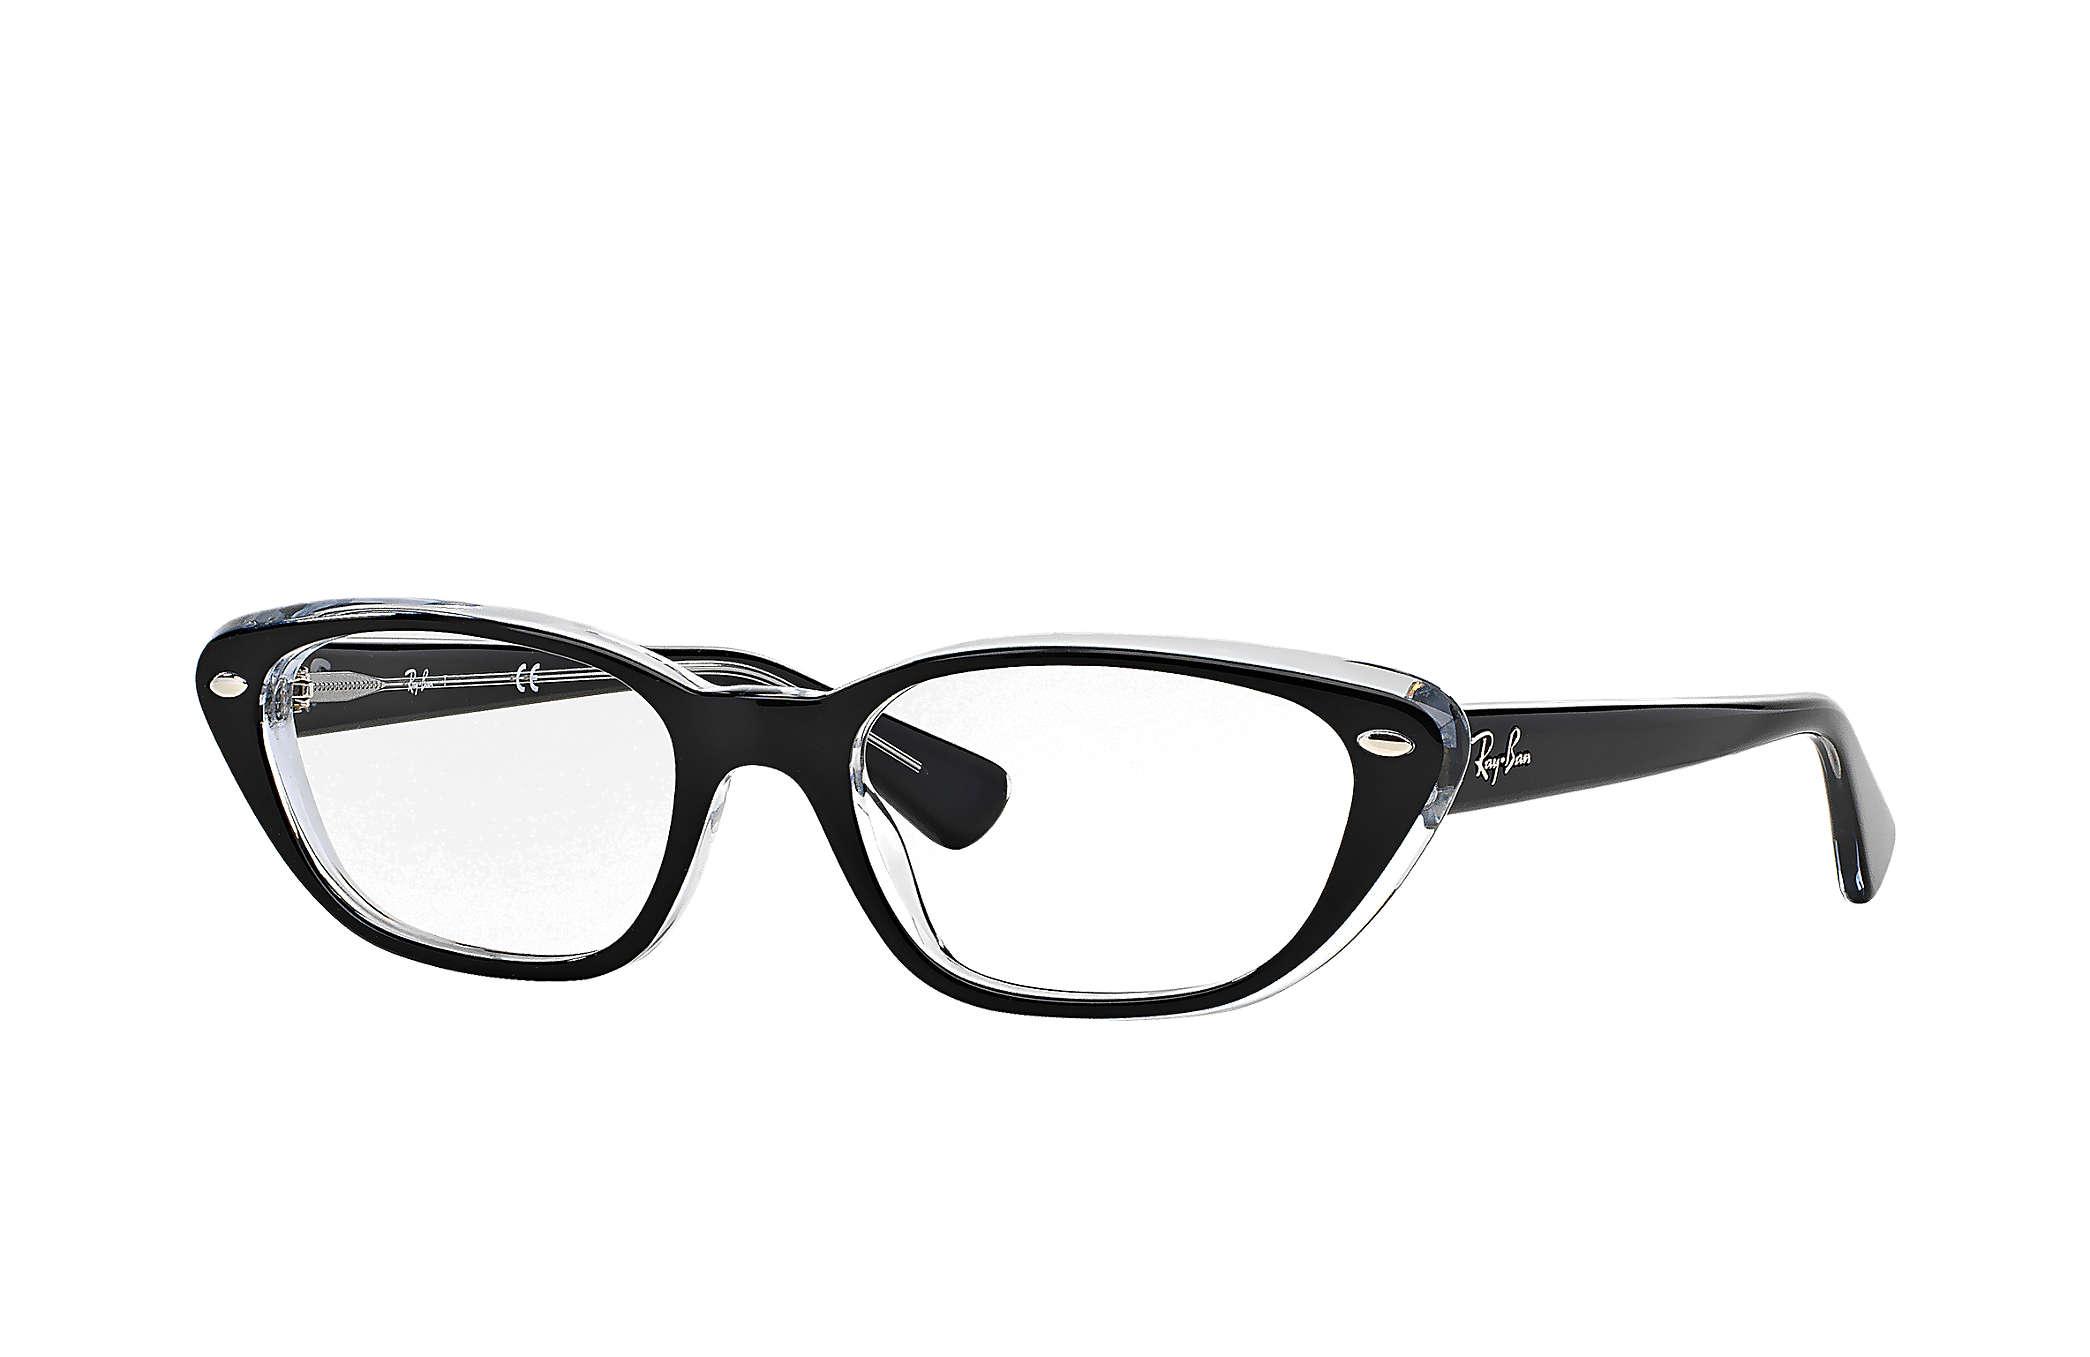 cb85dd7ac36fc Ray-Ban prescription glasses RB5242 Black - Acetate - 0RX5242203453 ...